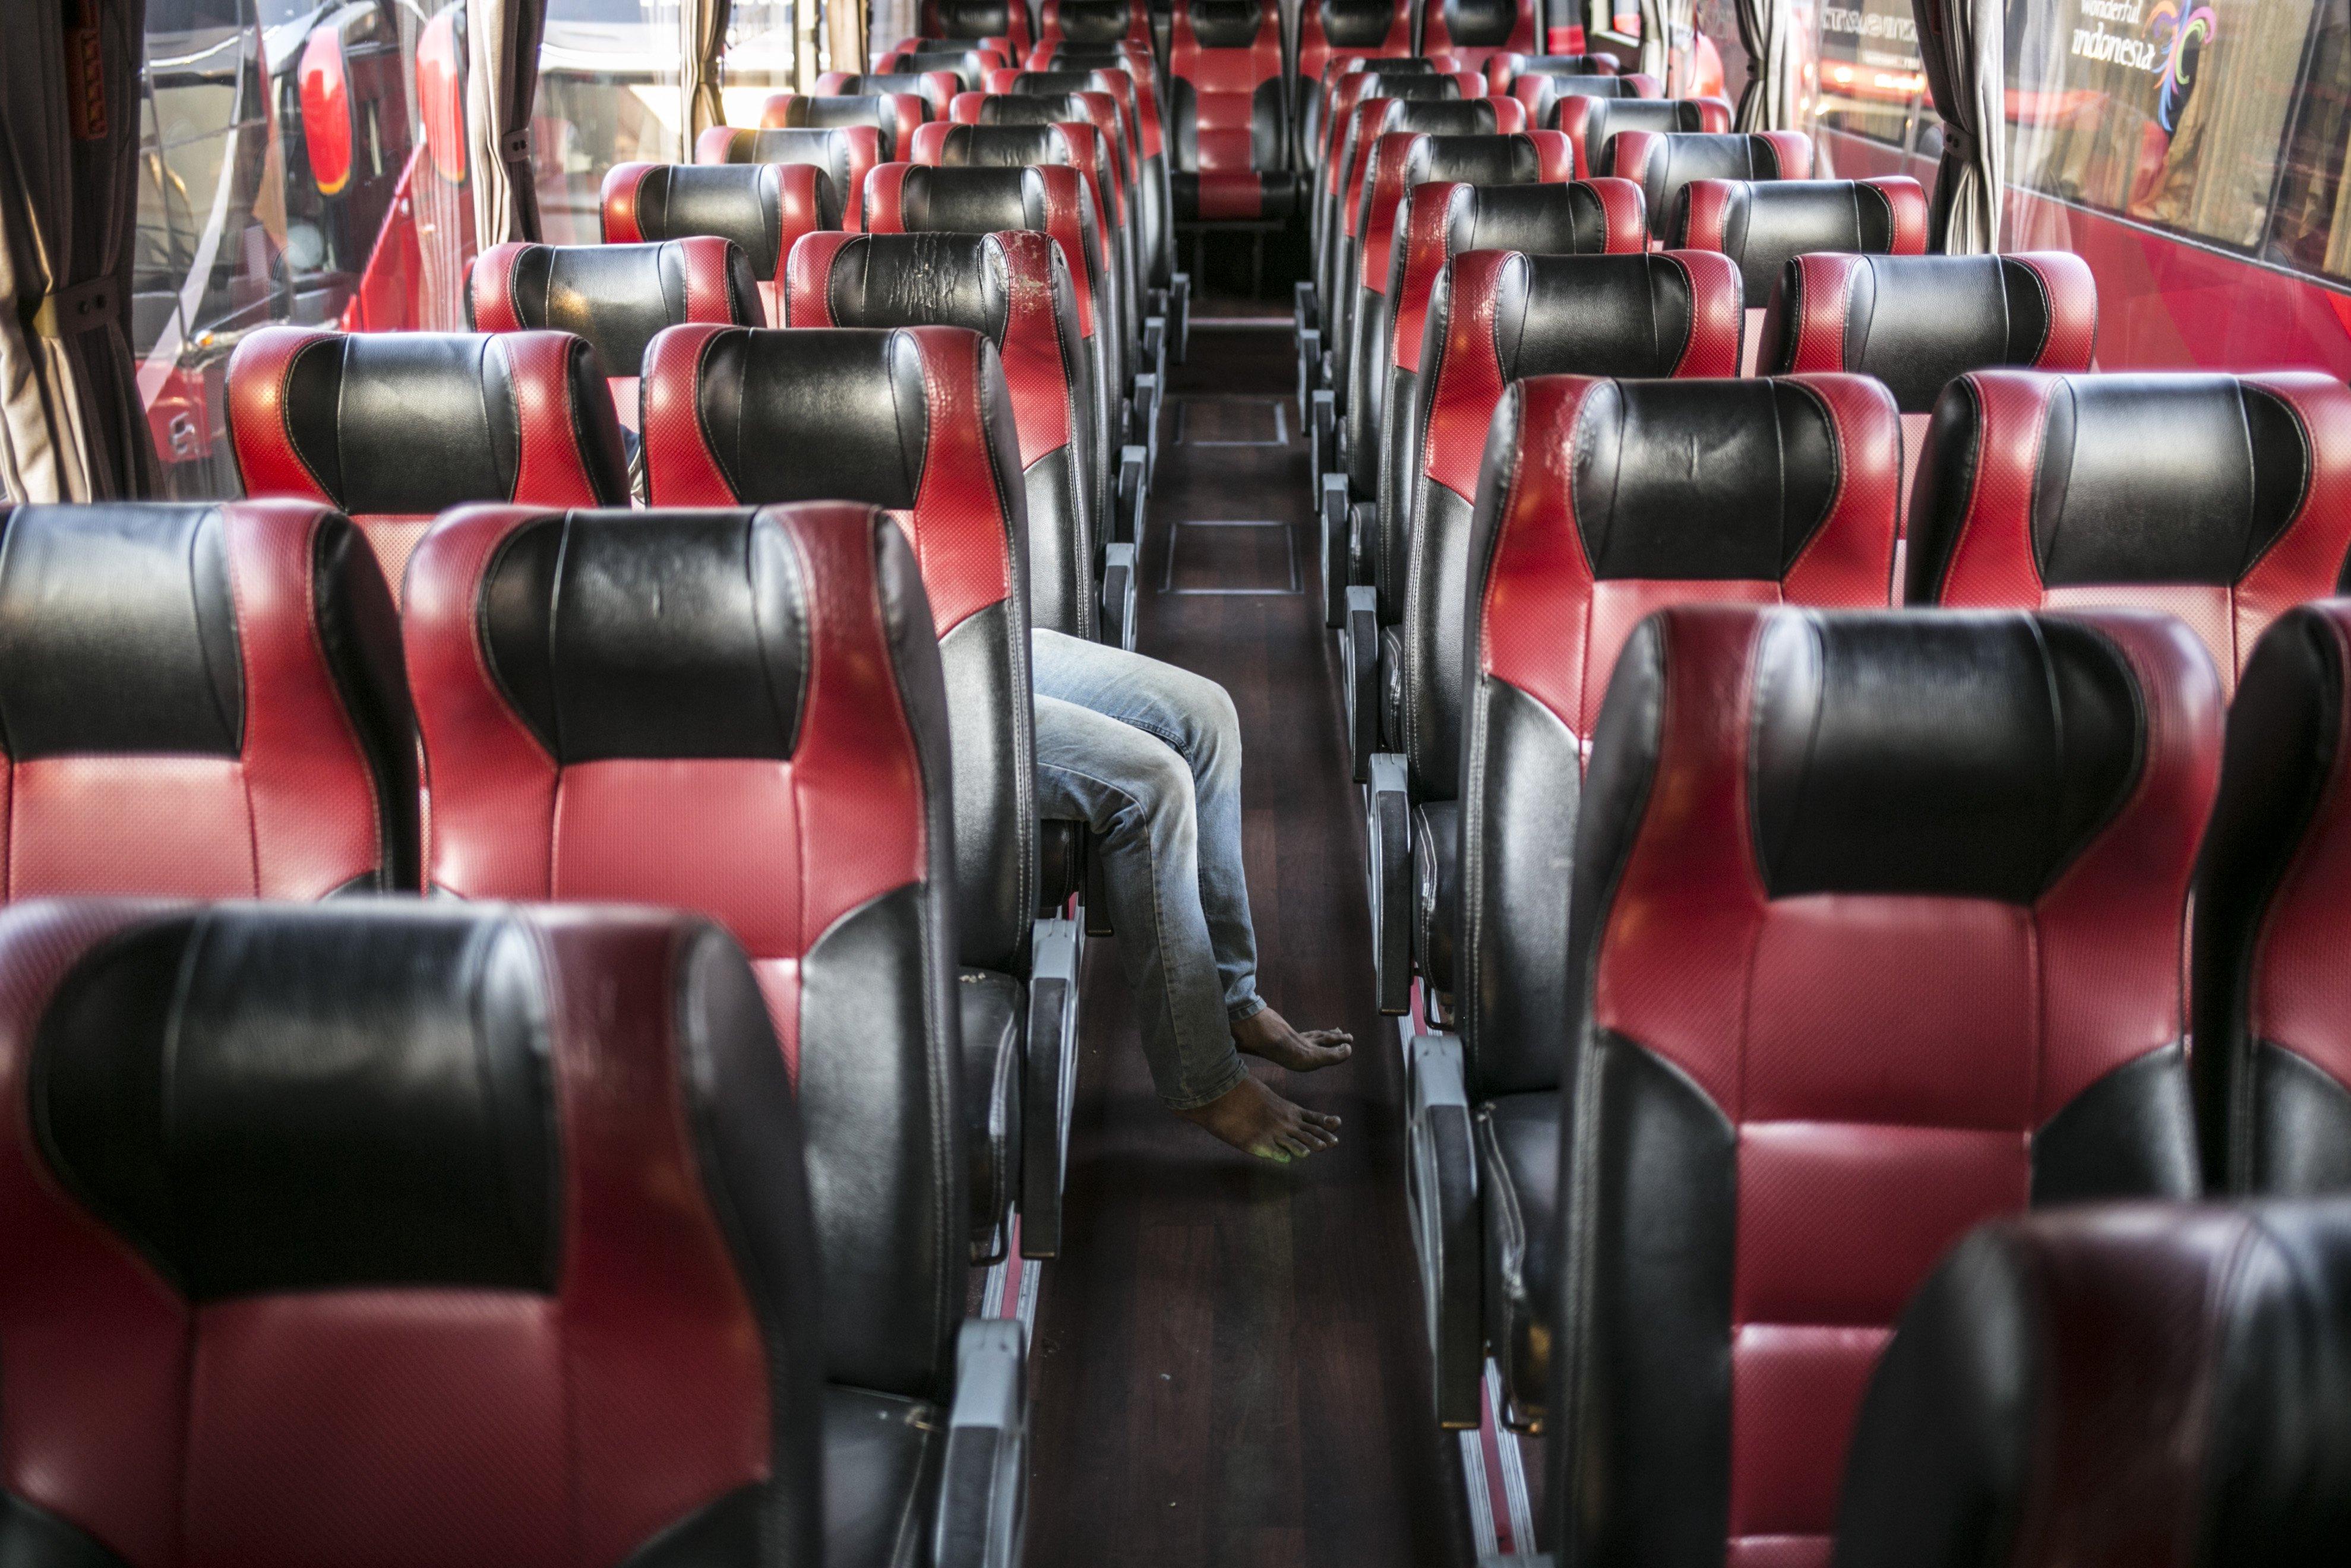 Driver bus beristirahat di salah satu pool bus pariwisata di kawasan Tanjung Barat, Jagakarsa, Jakarta, Selasa (28/7/2020). Masih diberlakukannya Pembatasan Sosial Bersekala Besar (PSBB) dan penutupan tempat rekreasi akibat Covid-19, berimbas pada jasa transportasi pariwisata. Sejak bulan Maret pengelola mengaku mengalami penurunan pendapatan dan penyewaan bus hingga 80%.